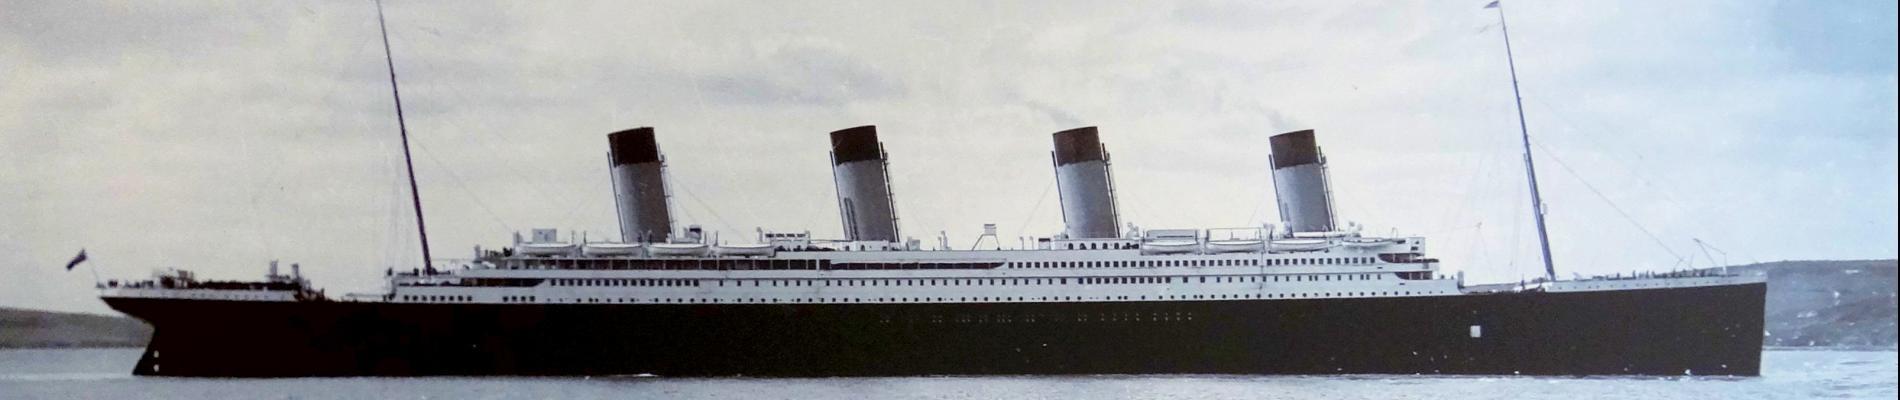 Of Icebergs & Inquiries: Michiganders on the Titanic